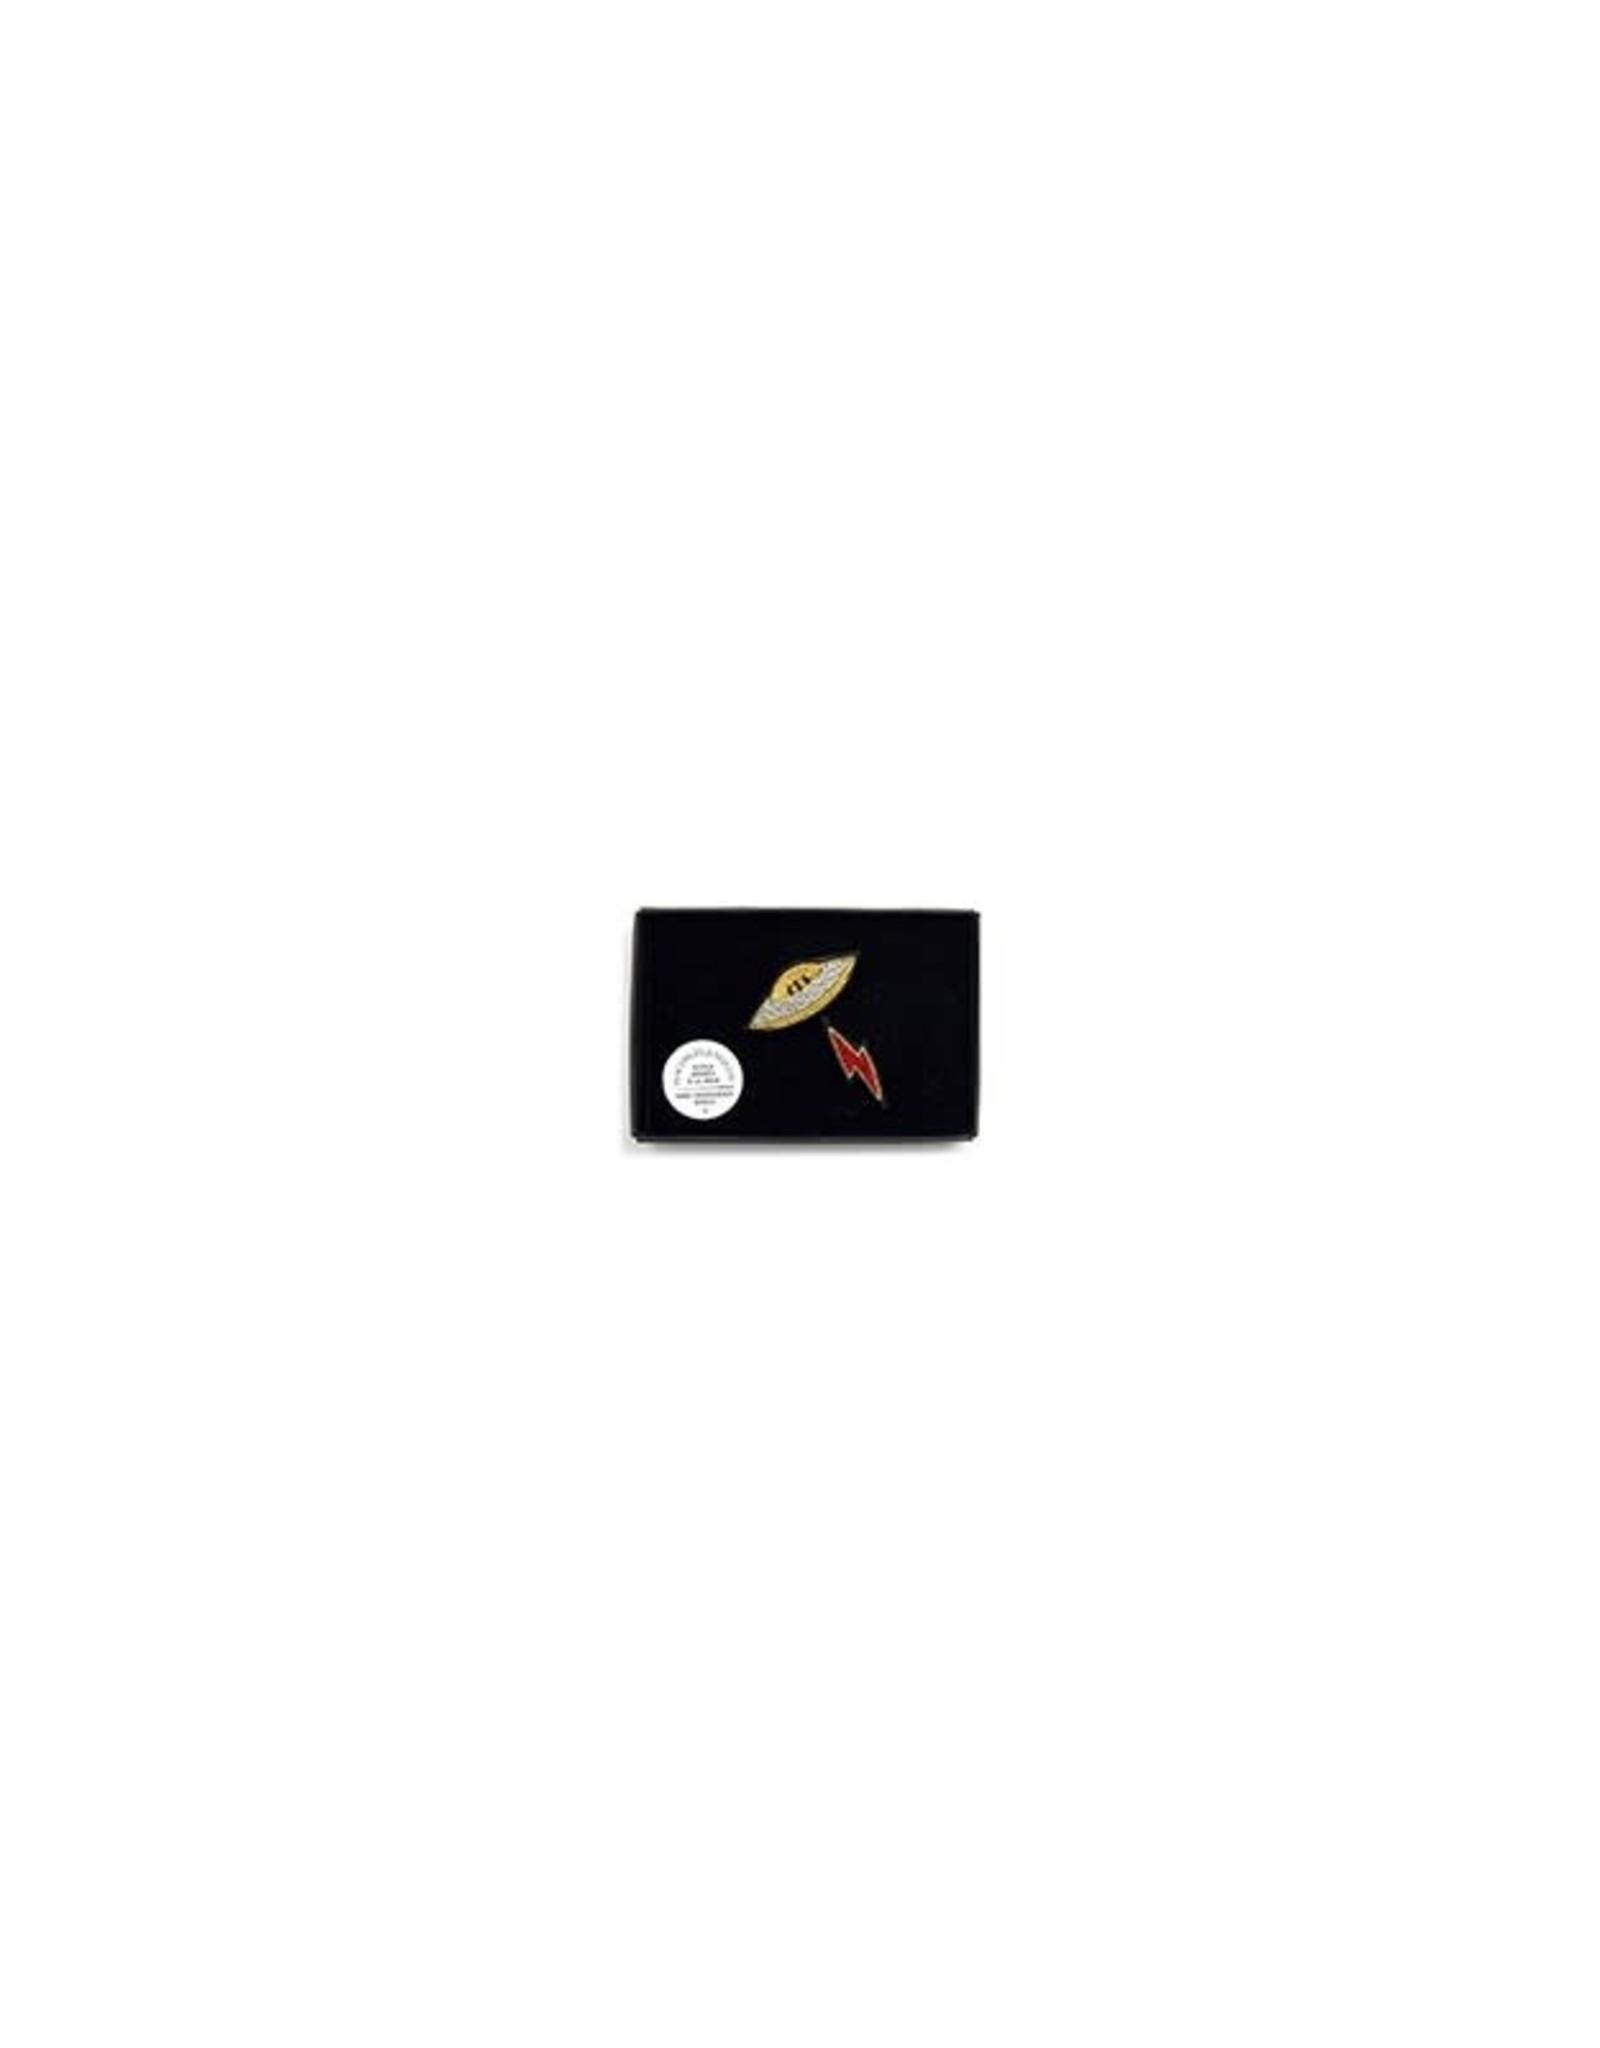 Macon & Lesquoy 'Spaceship' Pin